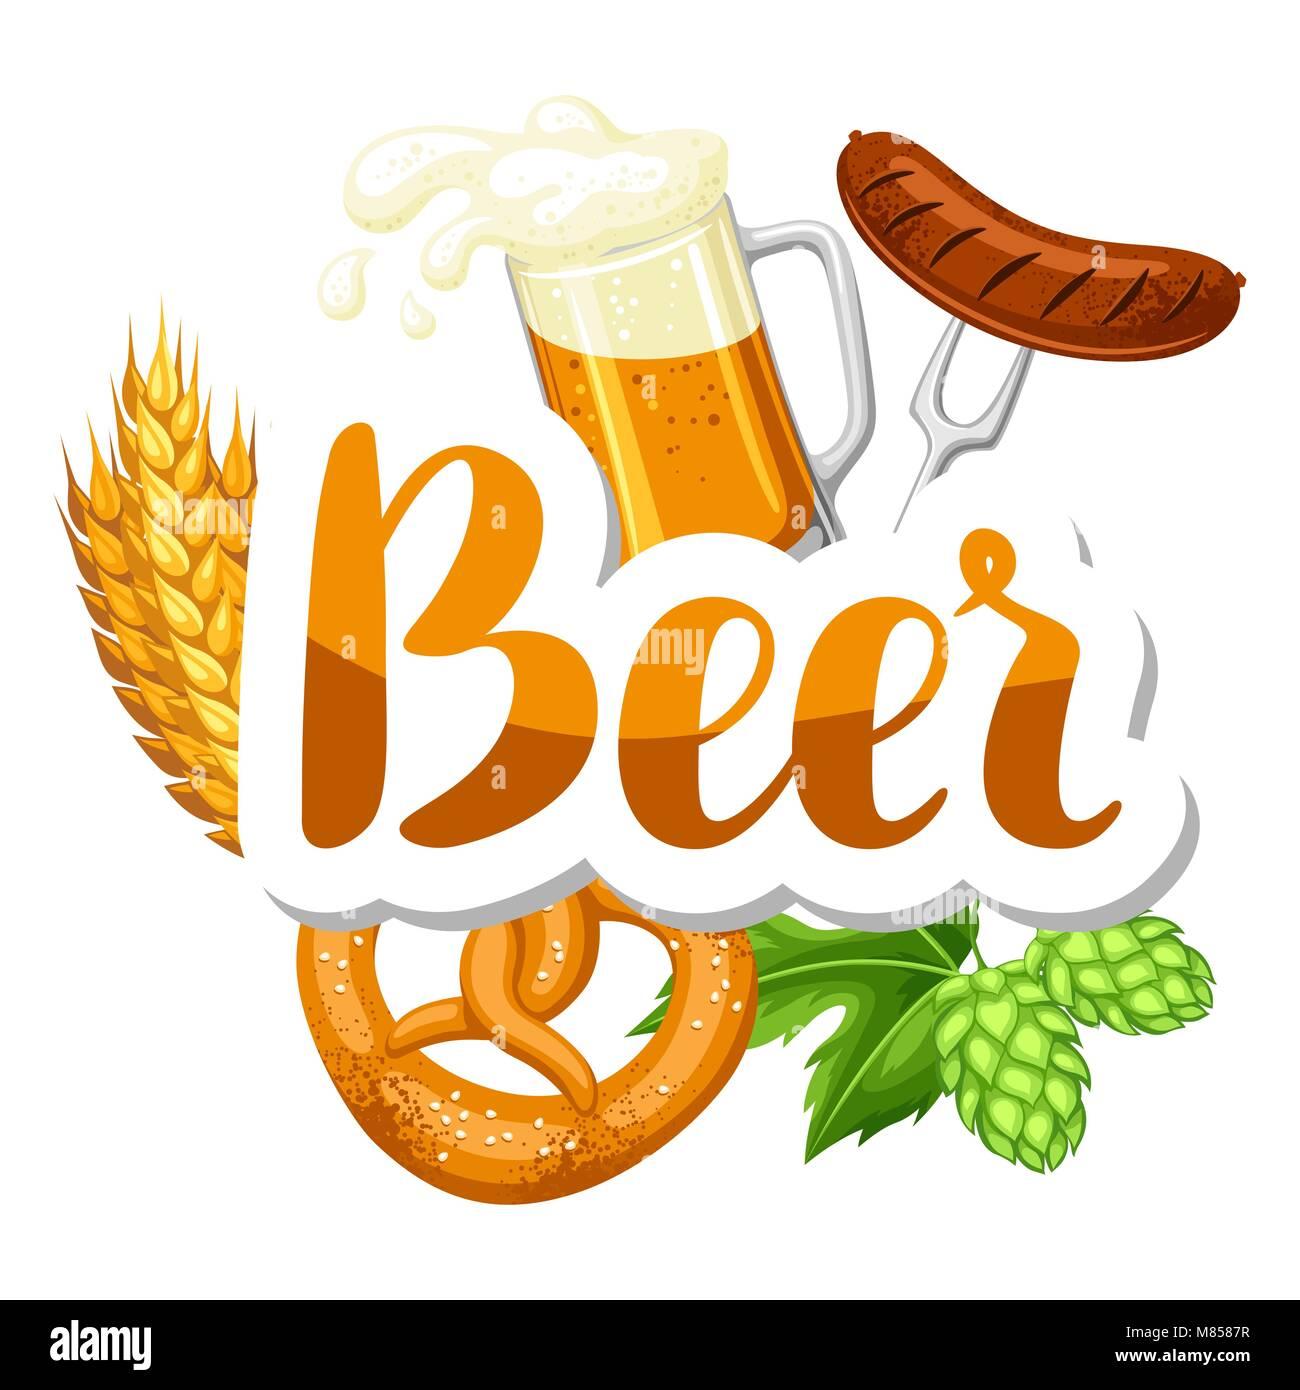 Oktoberfest beer festival. Illustration or poster for feast - Stock Image